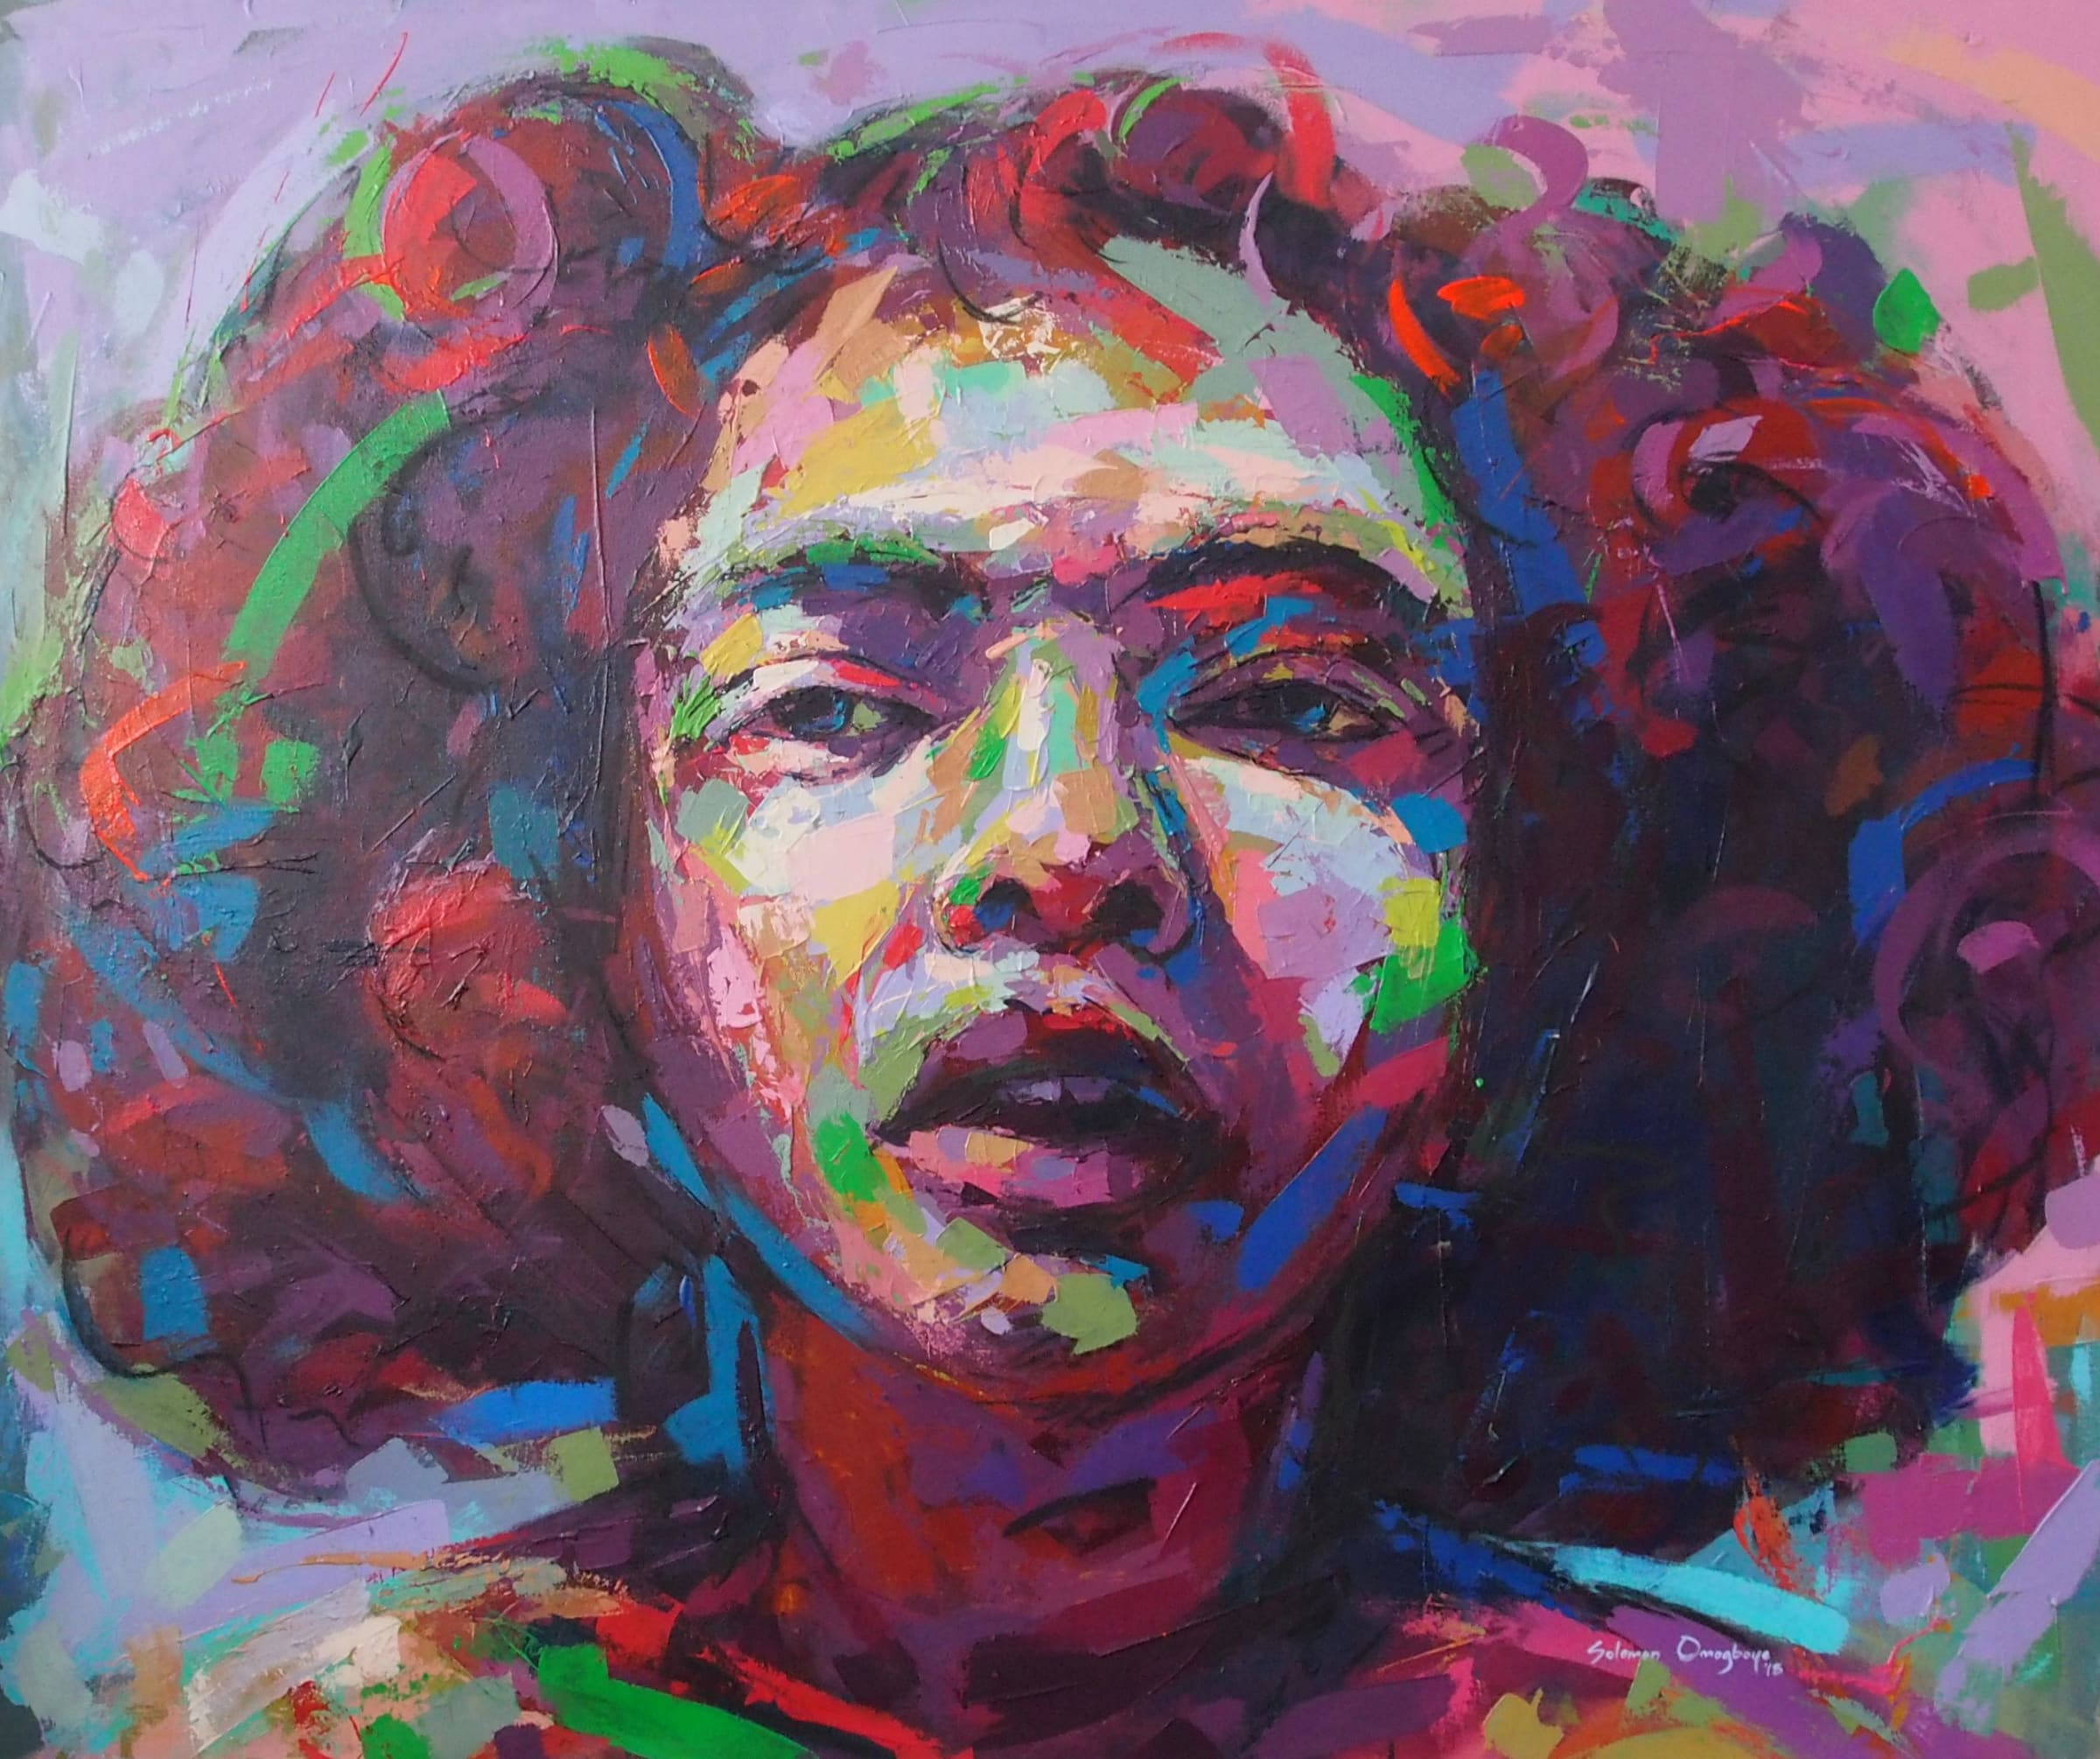 <span class=&#34;link fancybox-details-link&#34;><a href=&#34;/artists/39-solomon-omogboye/works/2013-solomon-omogboye-reflection-3-2018/&#34;>View Detail Page</a></span><div class=&#34;artist&#34;><strong>Solomon Omogboye</strong></div> <div class=&#34;title&#34;><em>Reflection 3</em>, 2018</div> <div class=&#34;medium&#34;>Acrylic On Canvas</div> <div class=&#34;dimensions&#34;>160cm x 133.5cm</div><div class=&#34;price&#34;>R42,600.00</div>